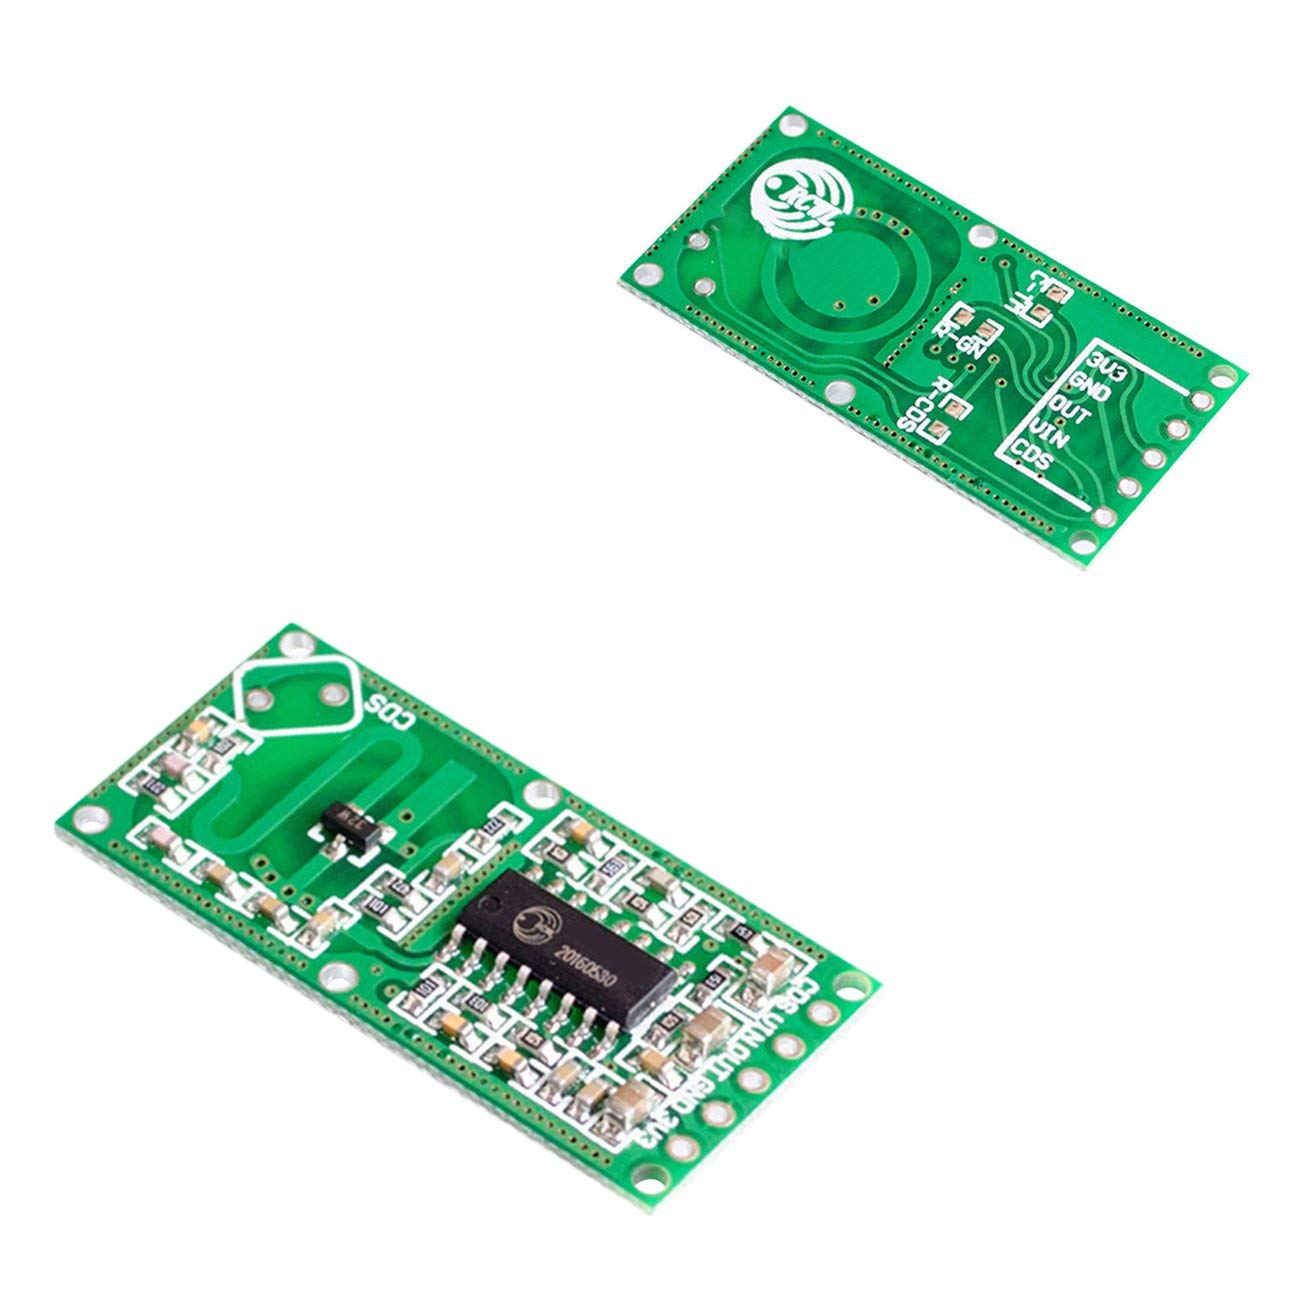 Amazon.com: Liobaba RCWL-0516 Doppler Radar Sensor Motion Detector Microwave Module for Arduino: Home Improvement